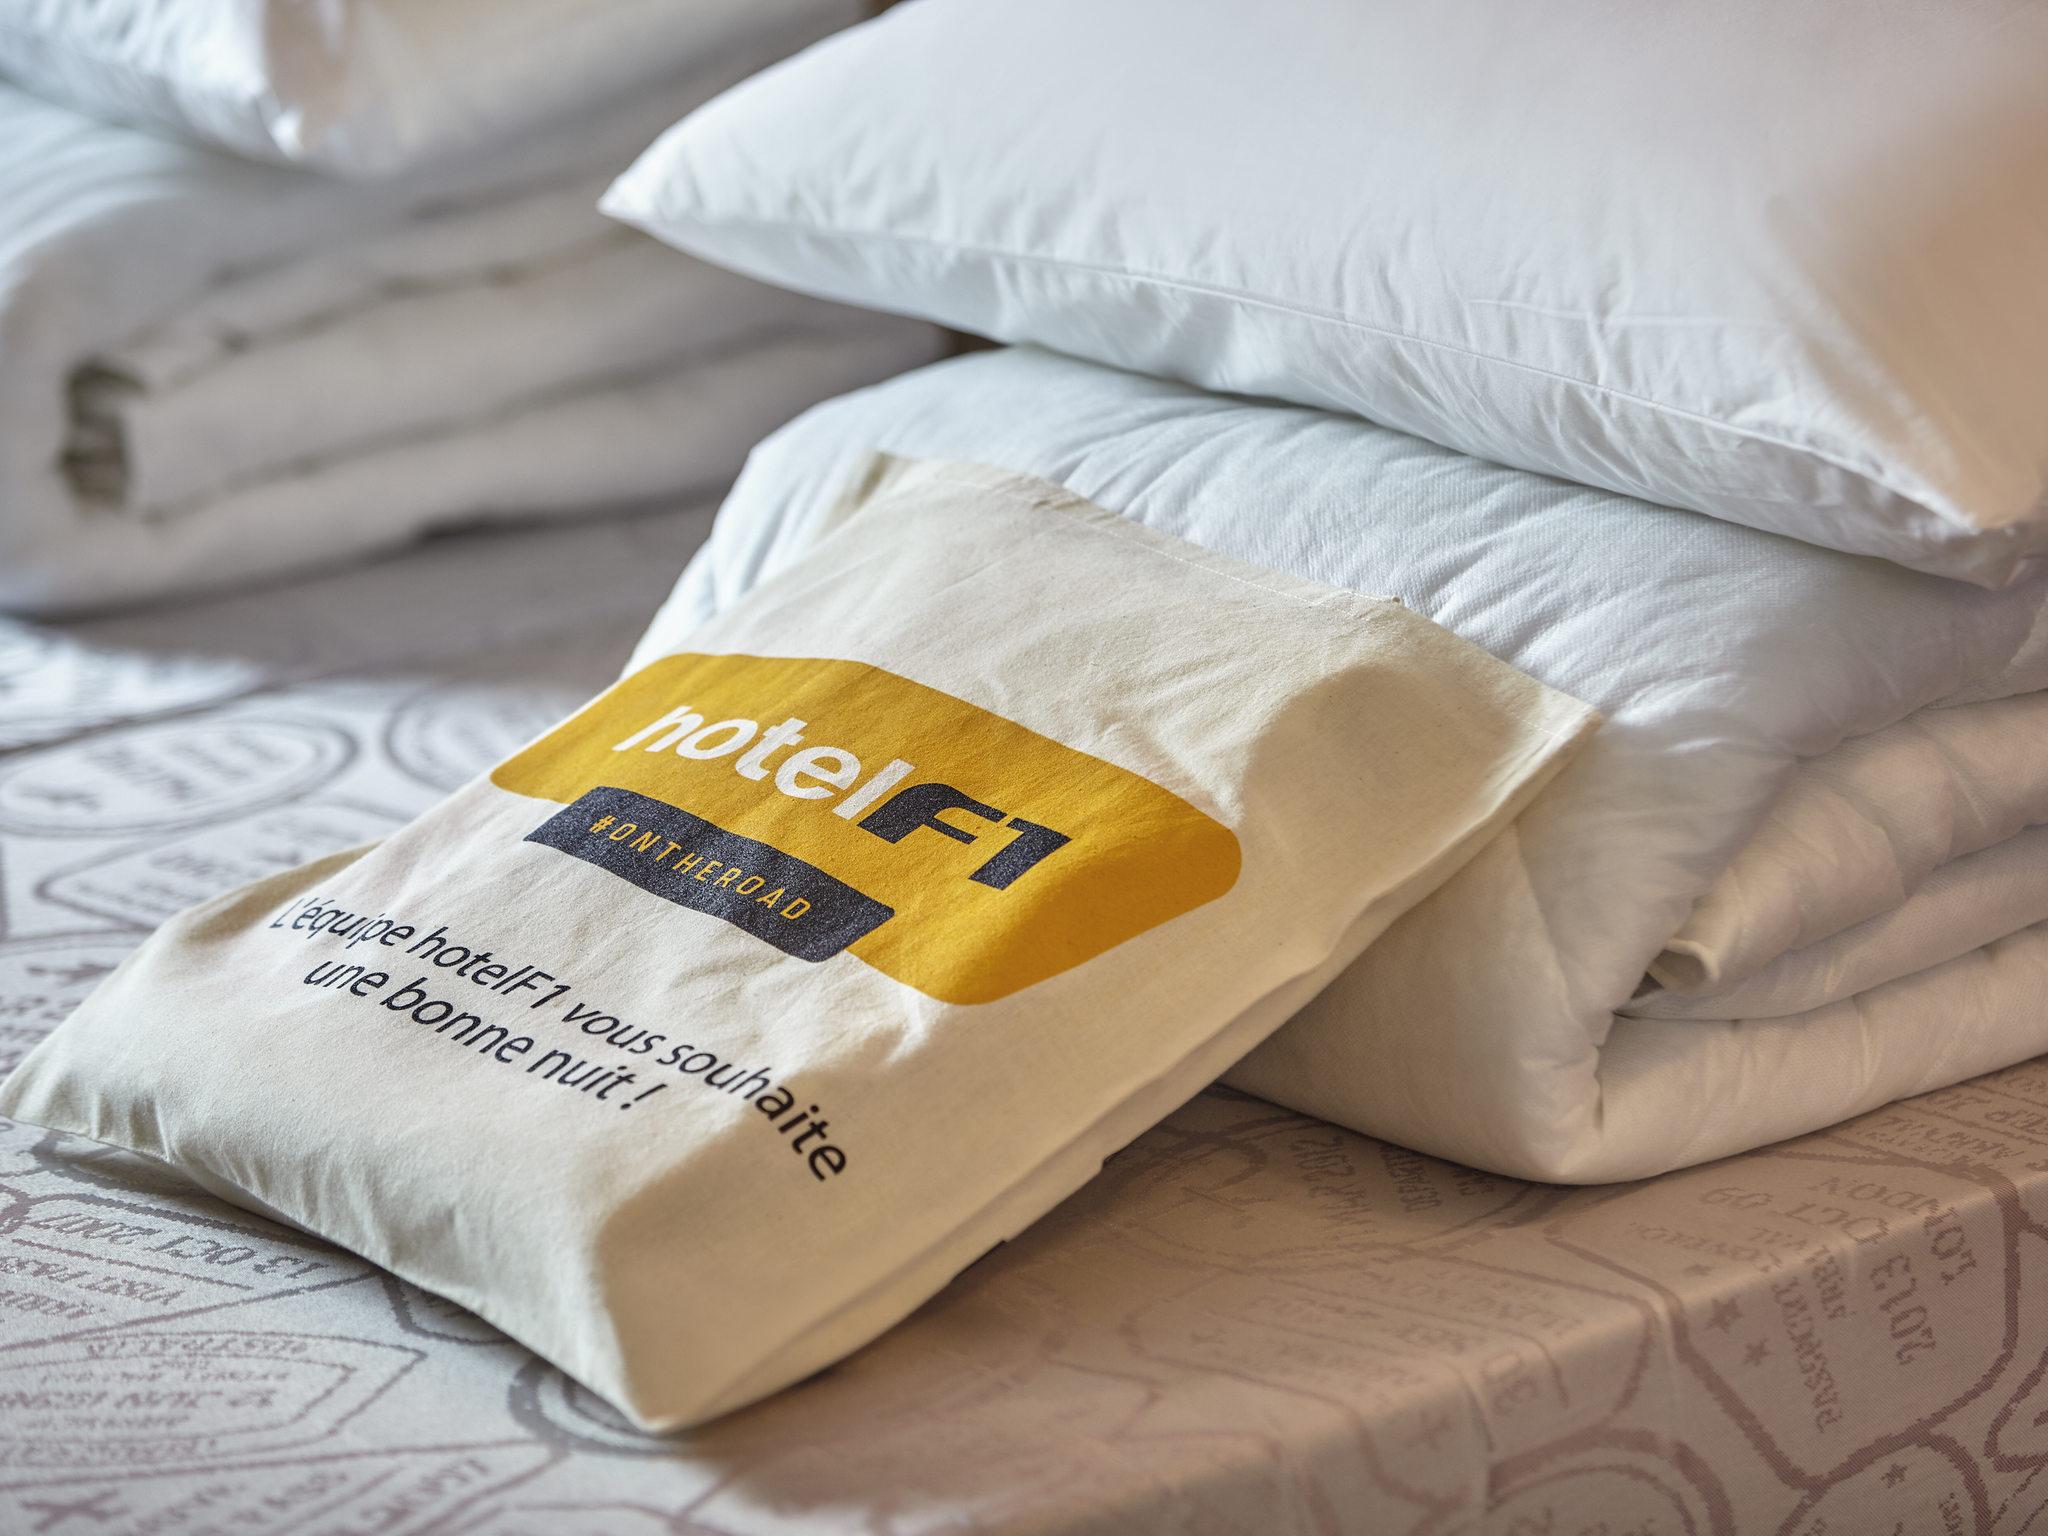 hotel a cabries hotelf1 marsiglia plan de campagne n 1. Black Bedroom Furniture Sets. Home Design Ideas